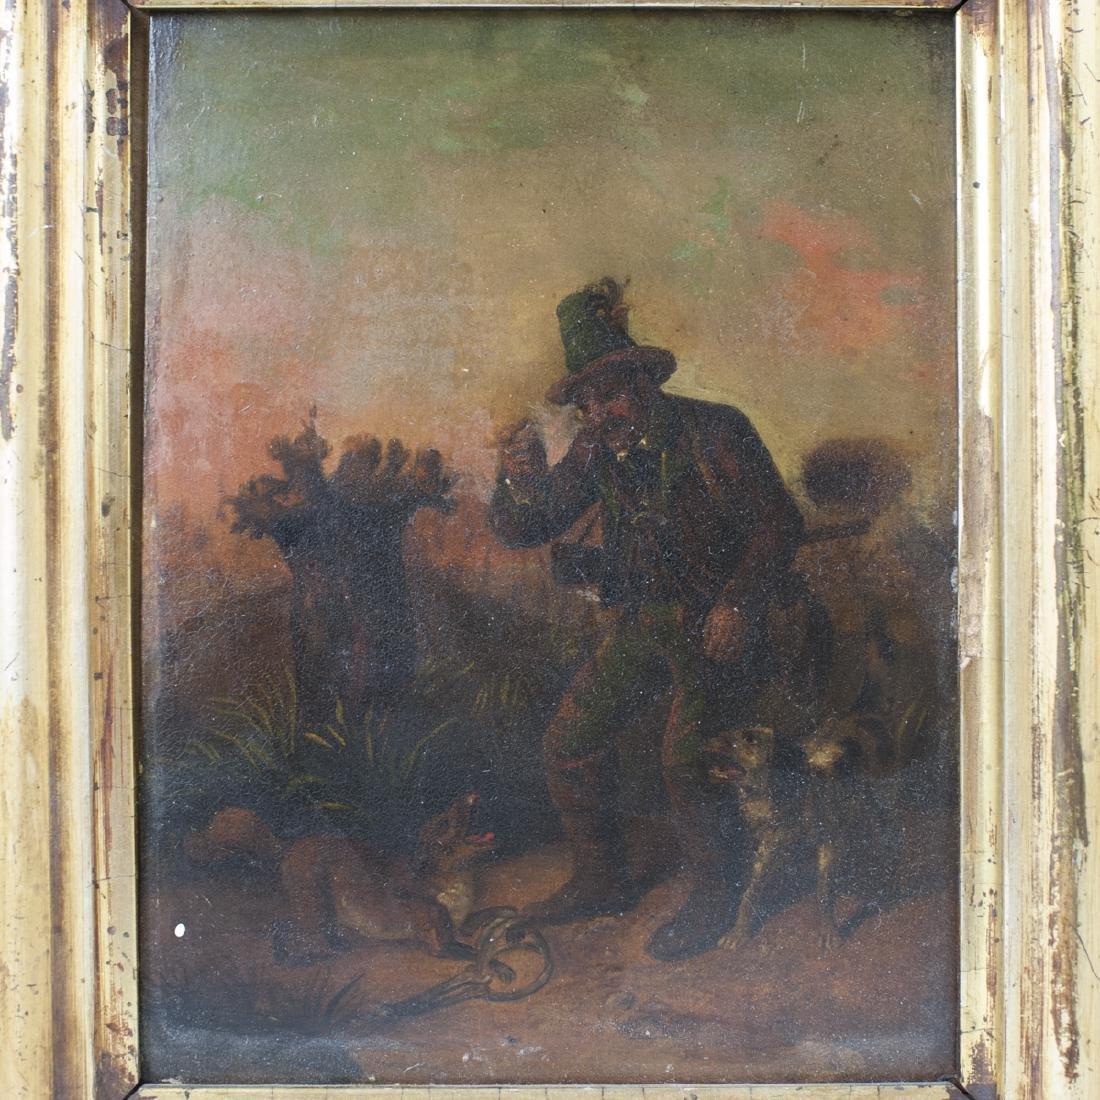 Antique Dutch Oil on Copper Paintings - 2